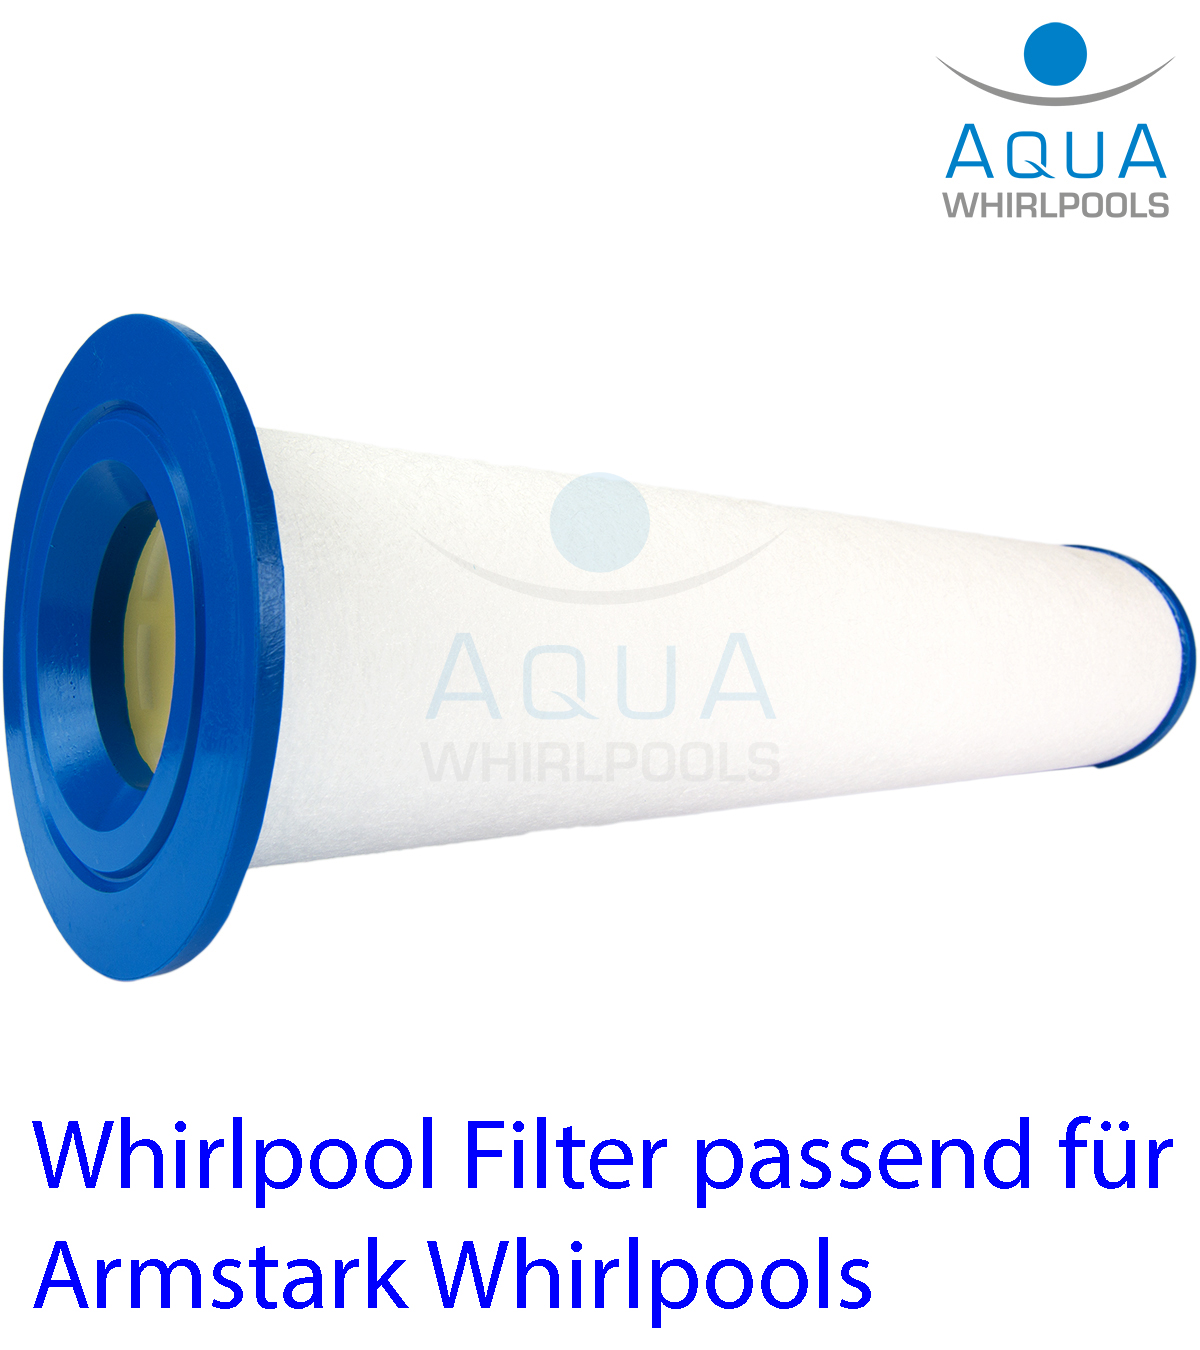 Whirlpool filter passend f r armstark whirlpools blog aqua whirlpools - Aqua whirlpools ...